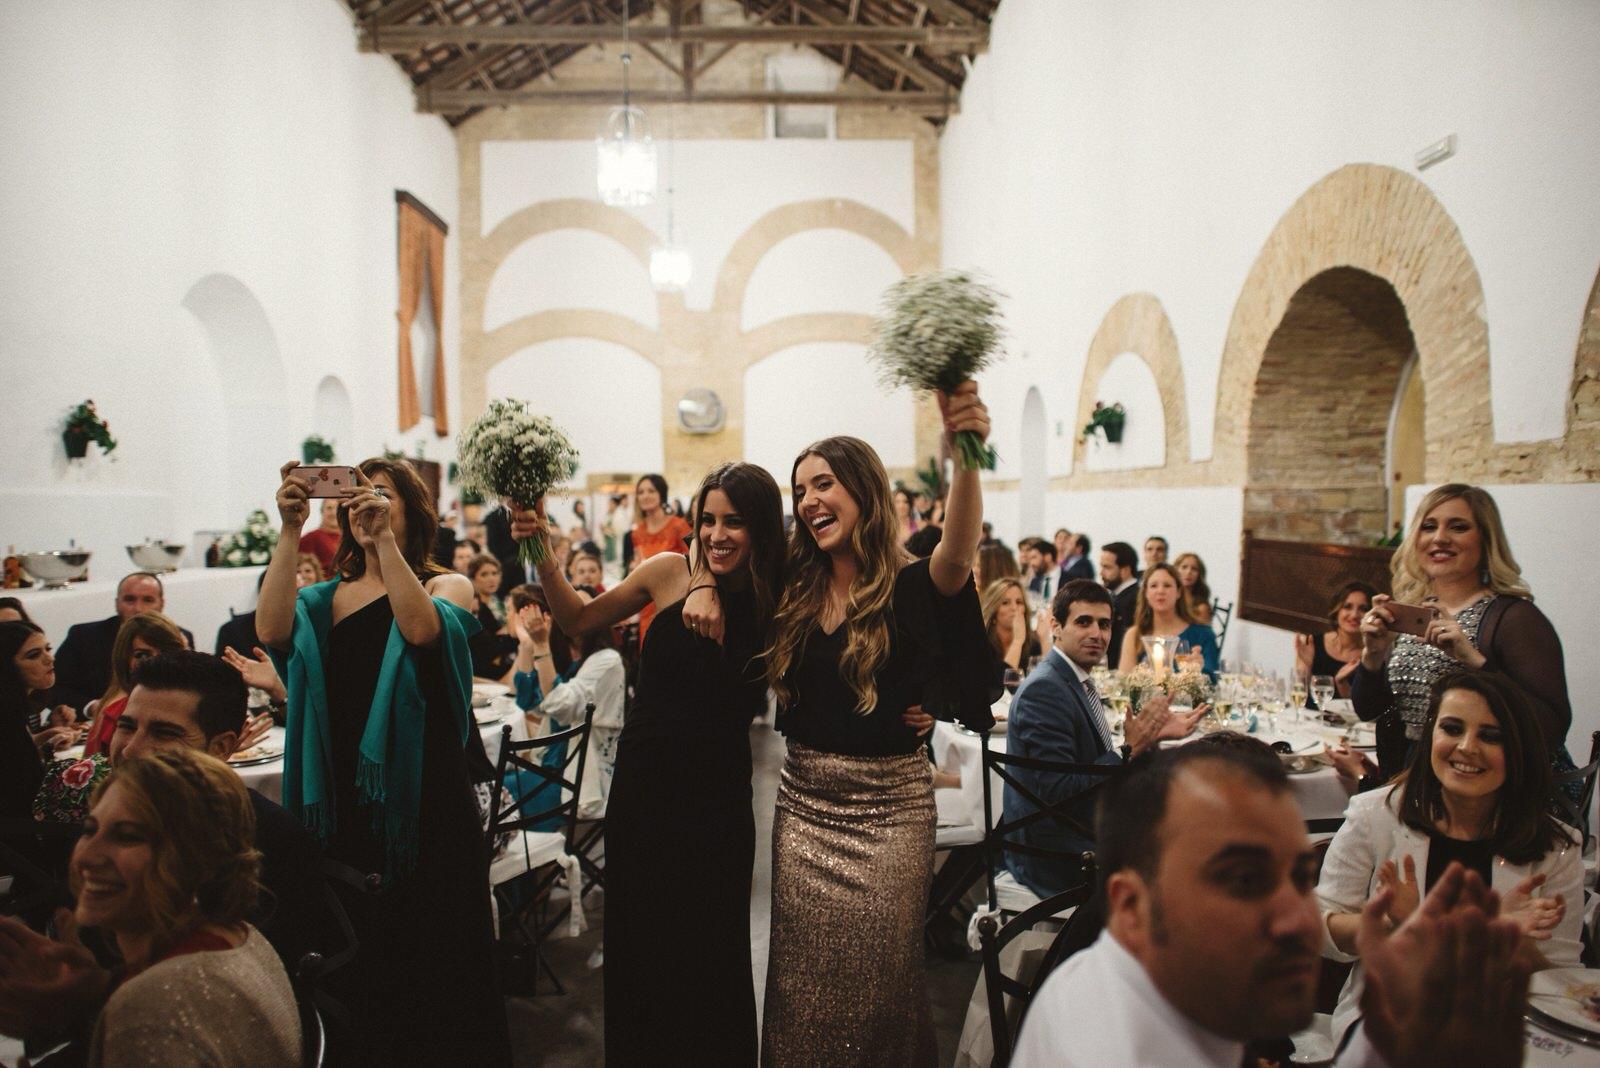 fotografo de bodas sevilla - fotografo boda - fotografía sevilla - Andrés AmarilloAAA_3546- fine.JPG